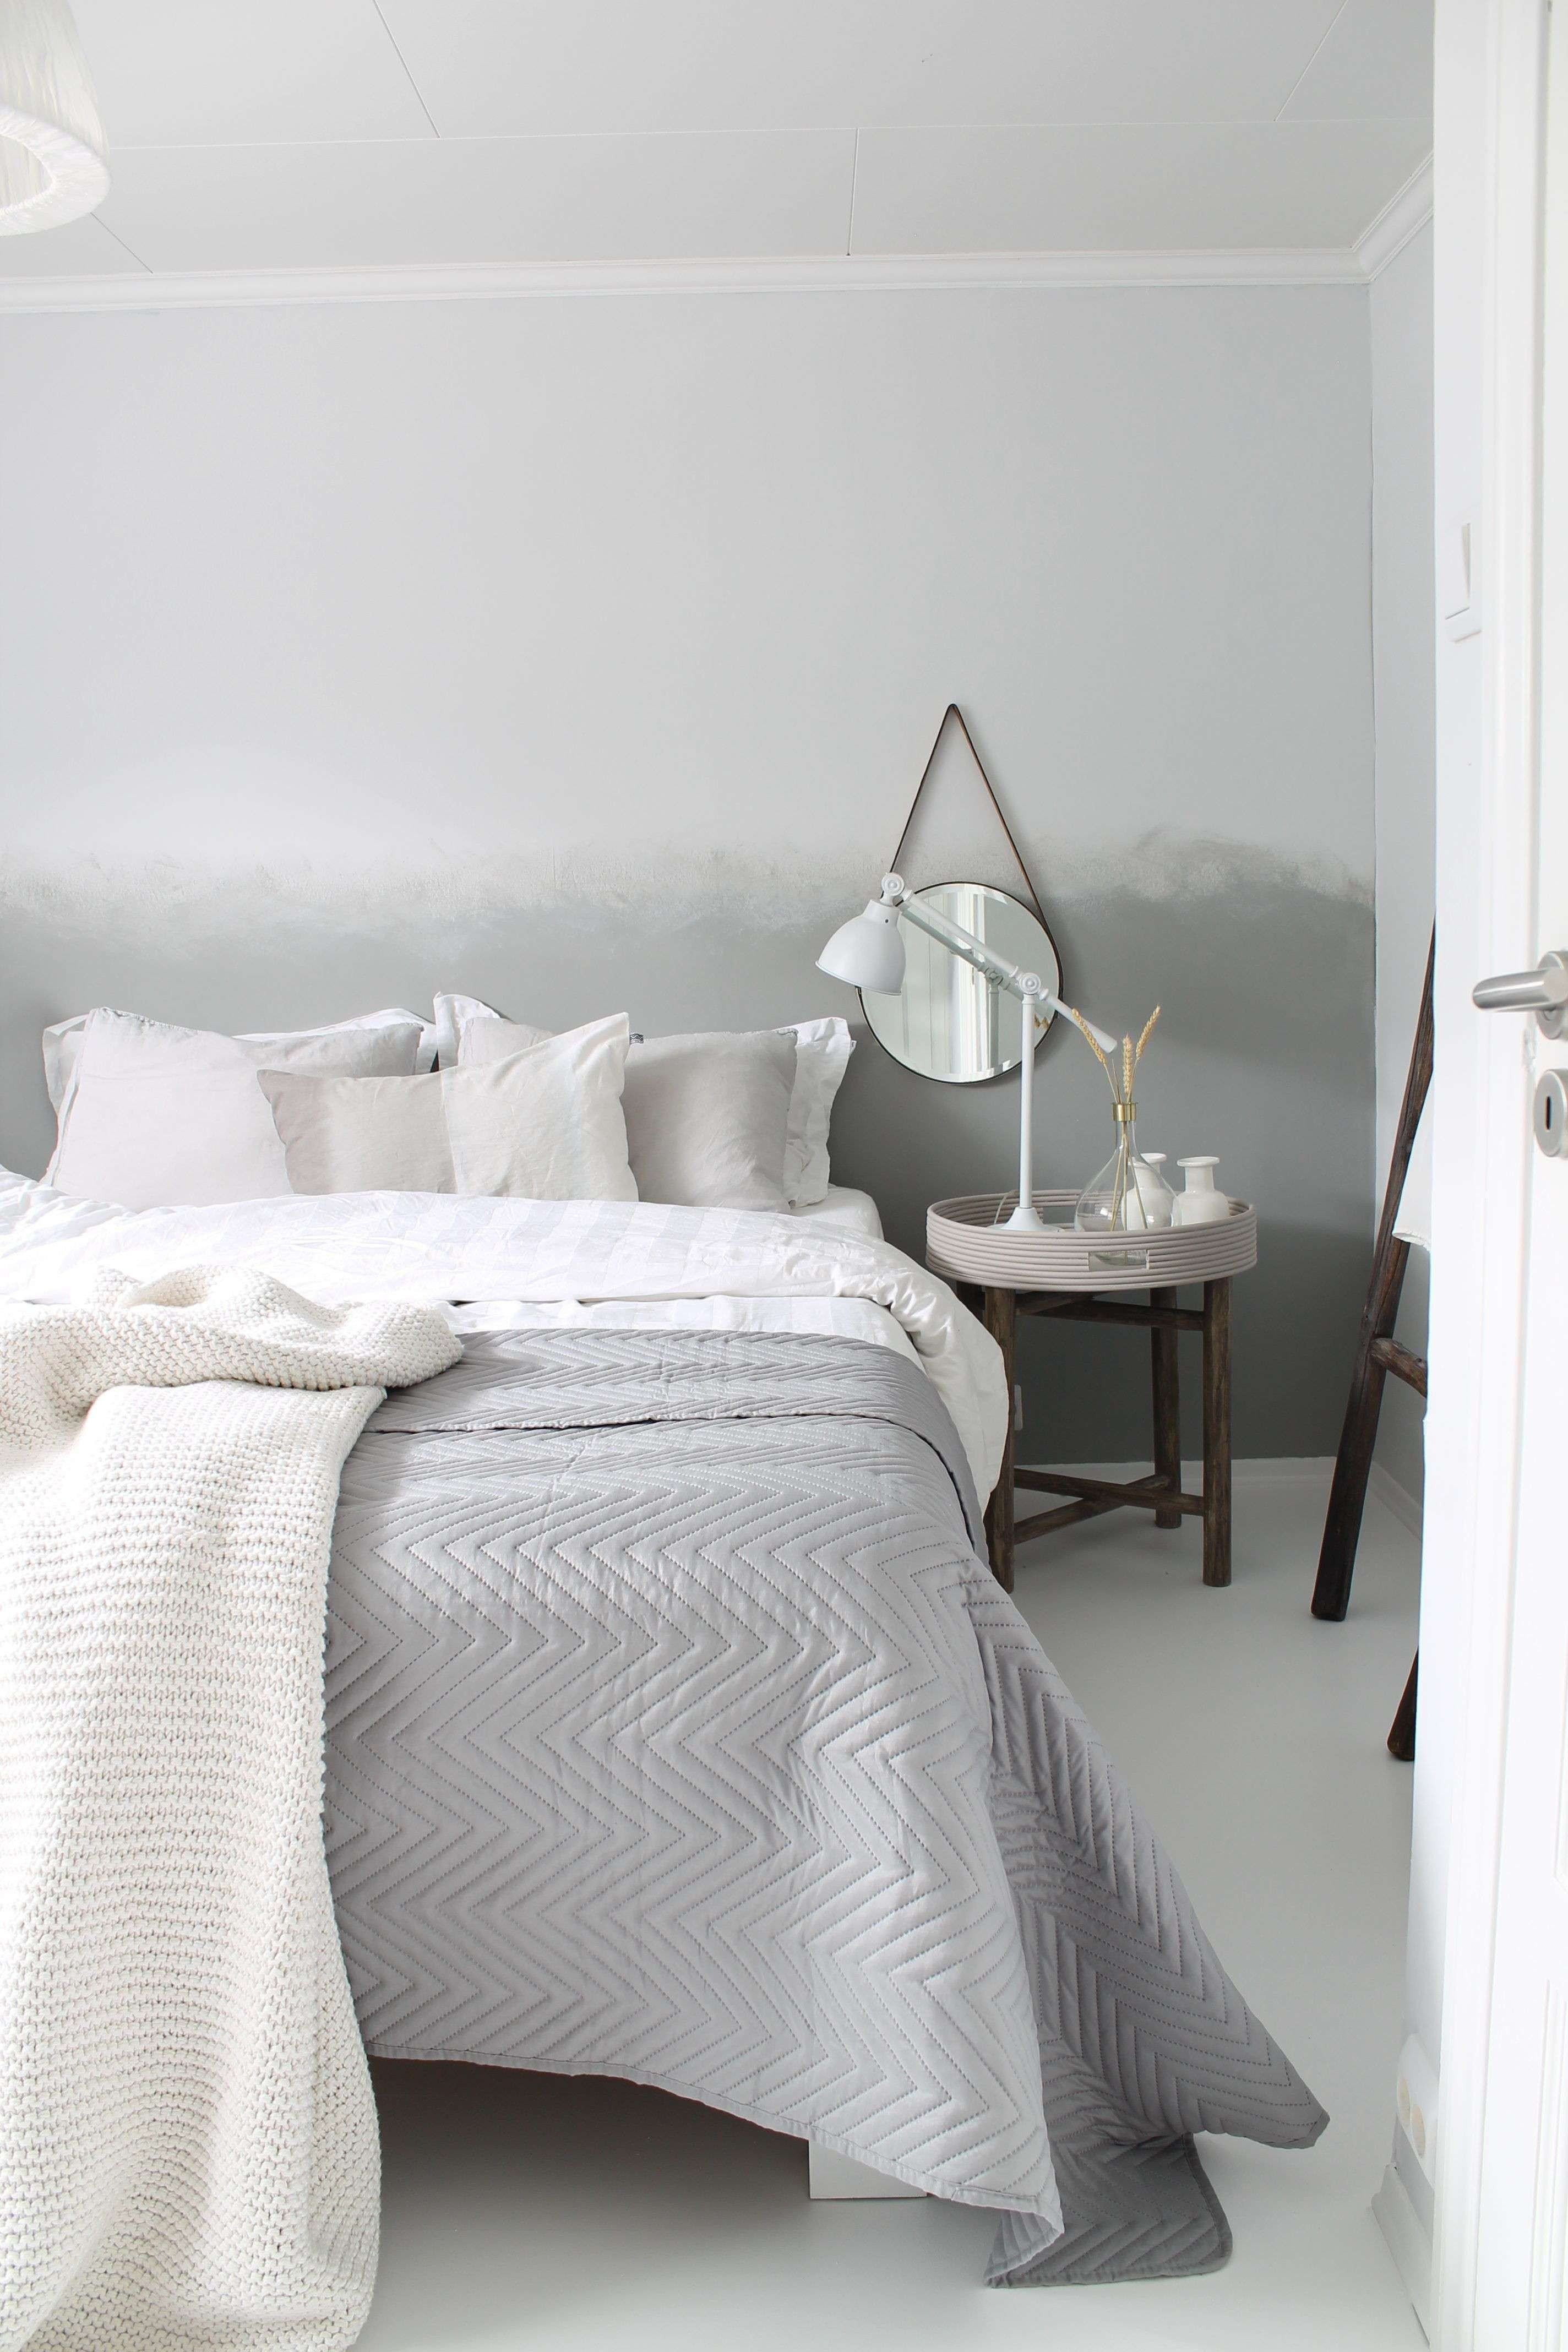 Tan and White Bedroom Inspirational 18 Nice Dark Hardwood Floors Bedroom